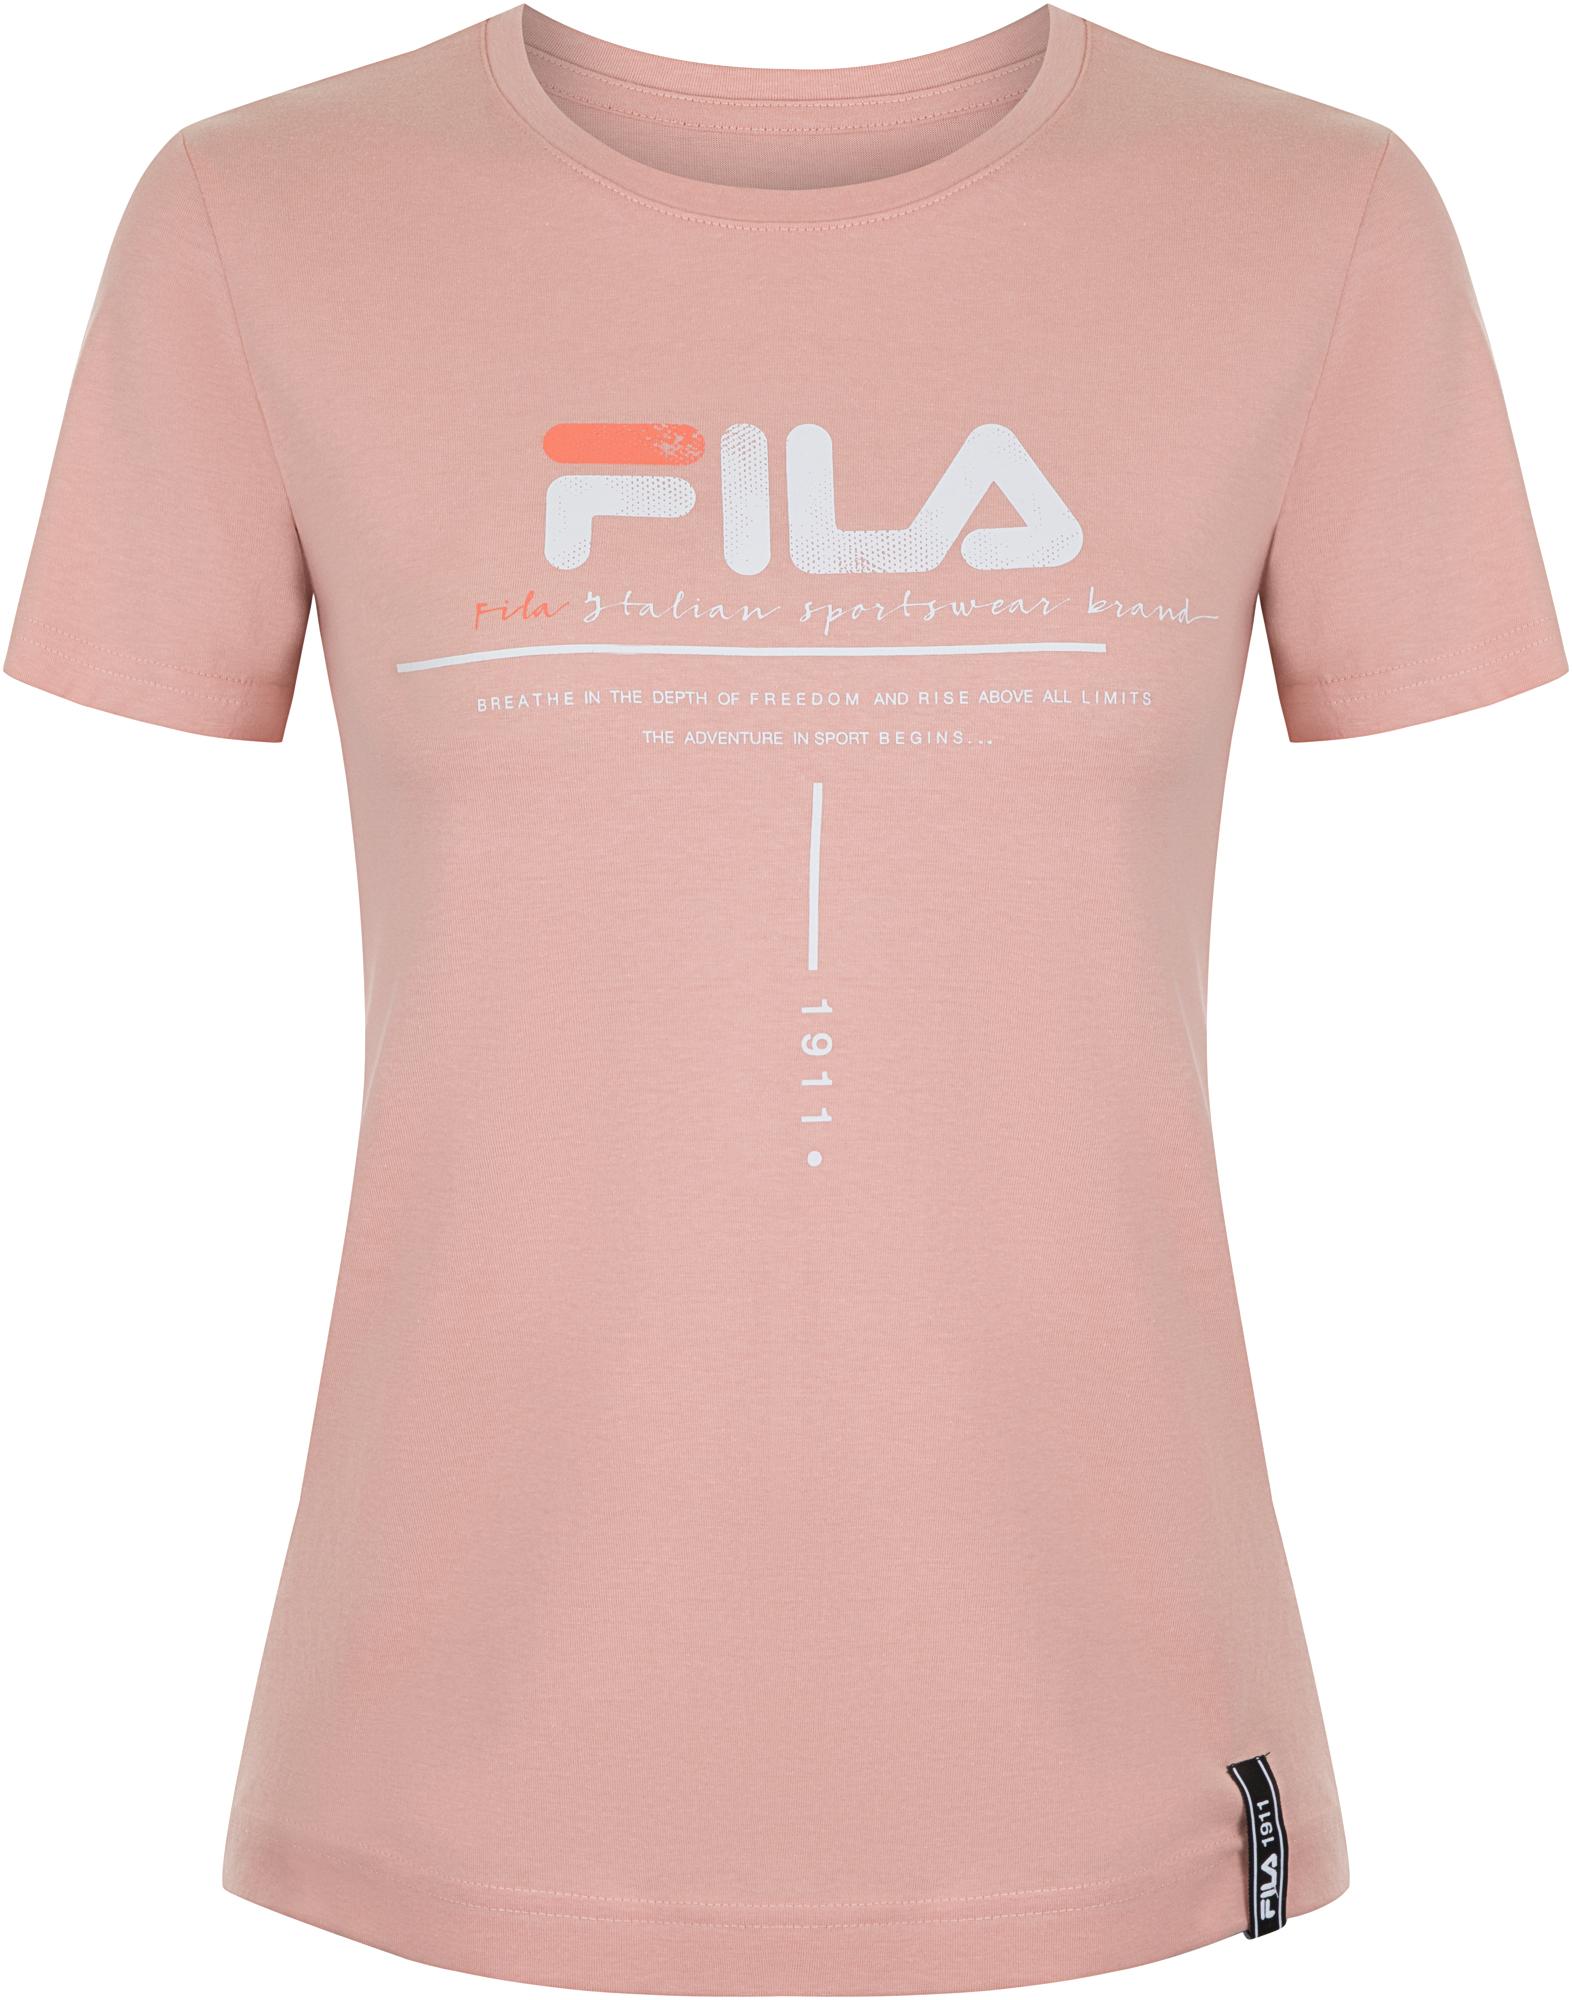 Fila Футболка женская Fila, размер 48 цена